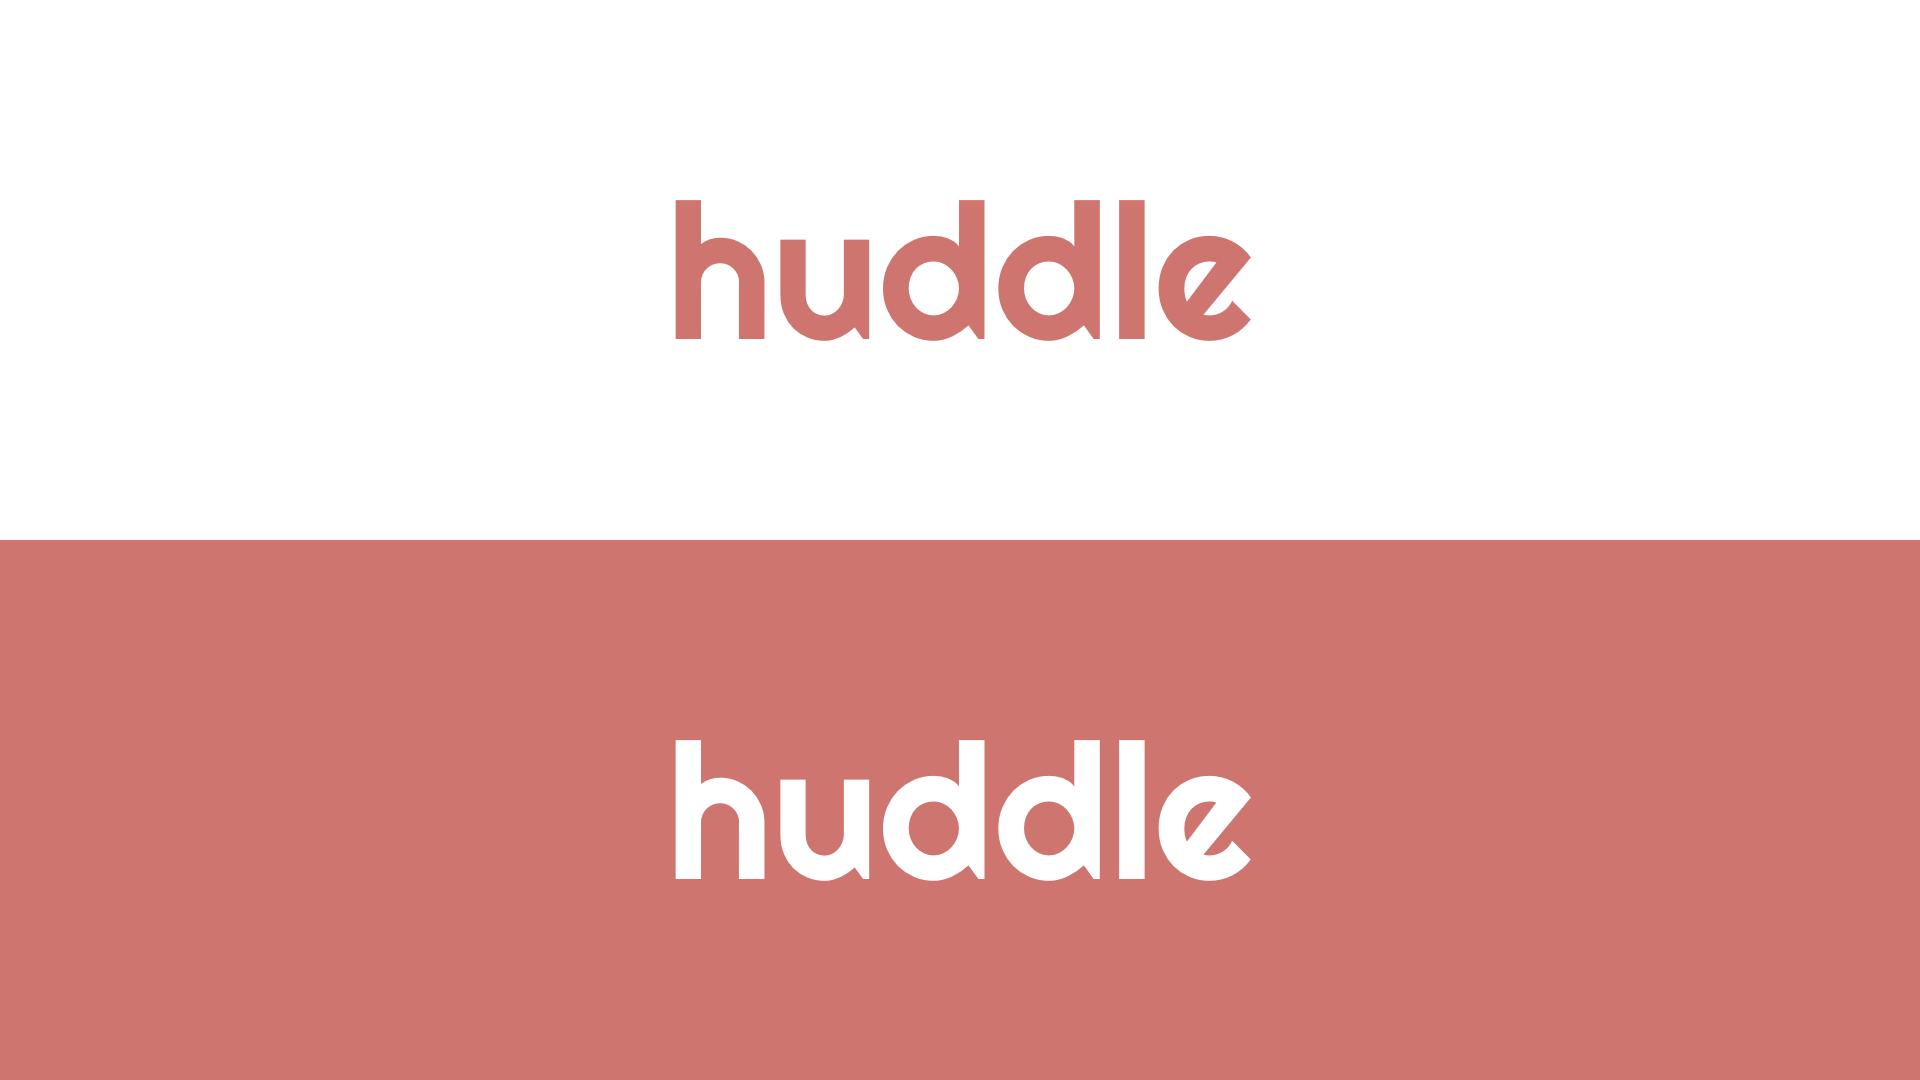 huddle service.001.png